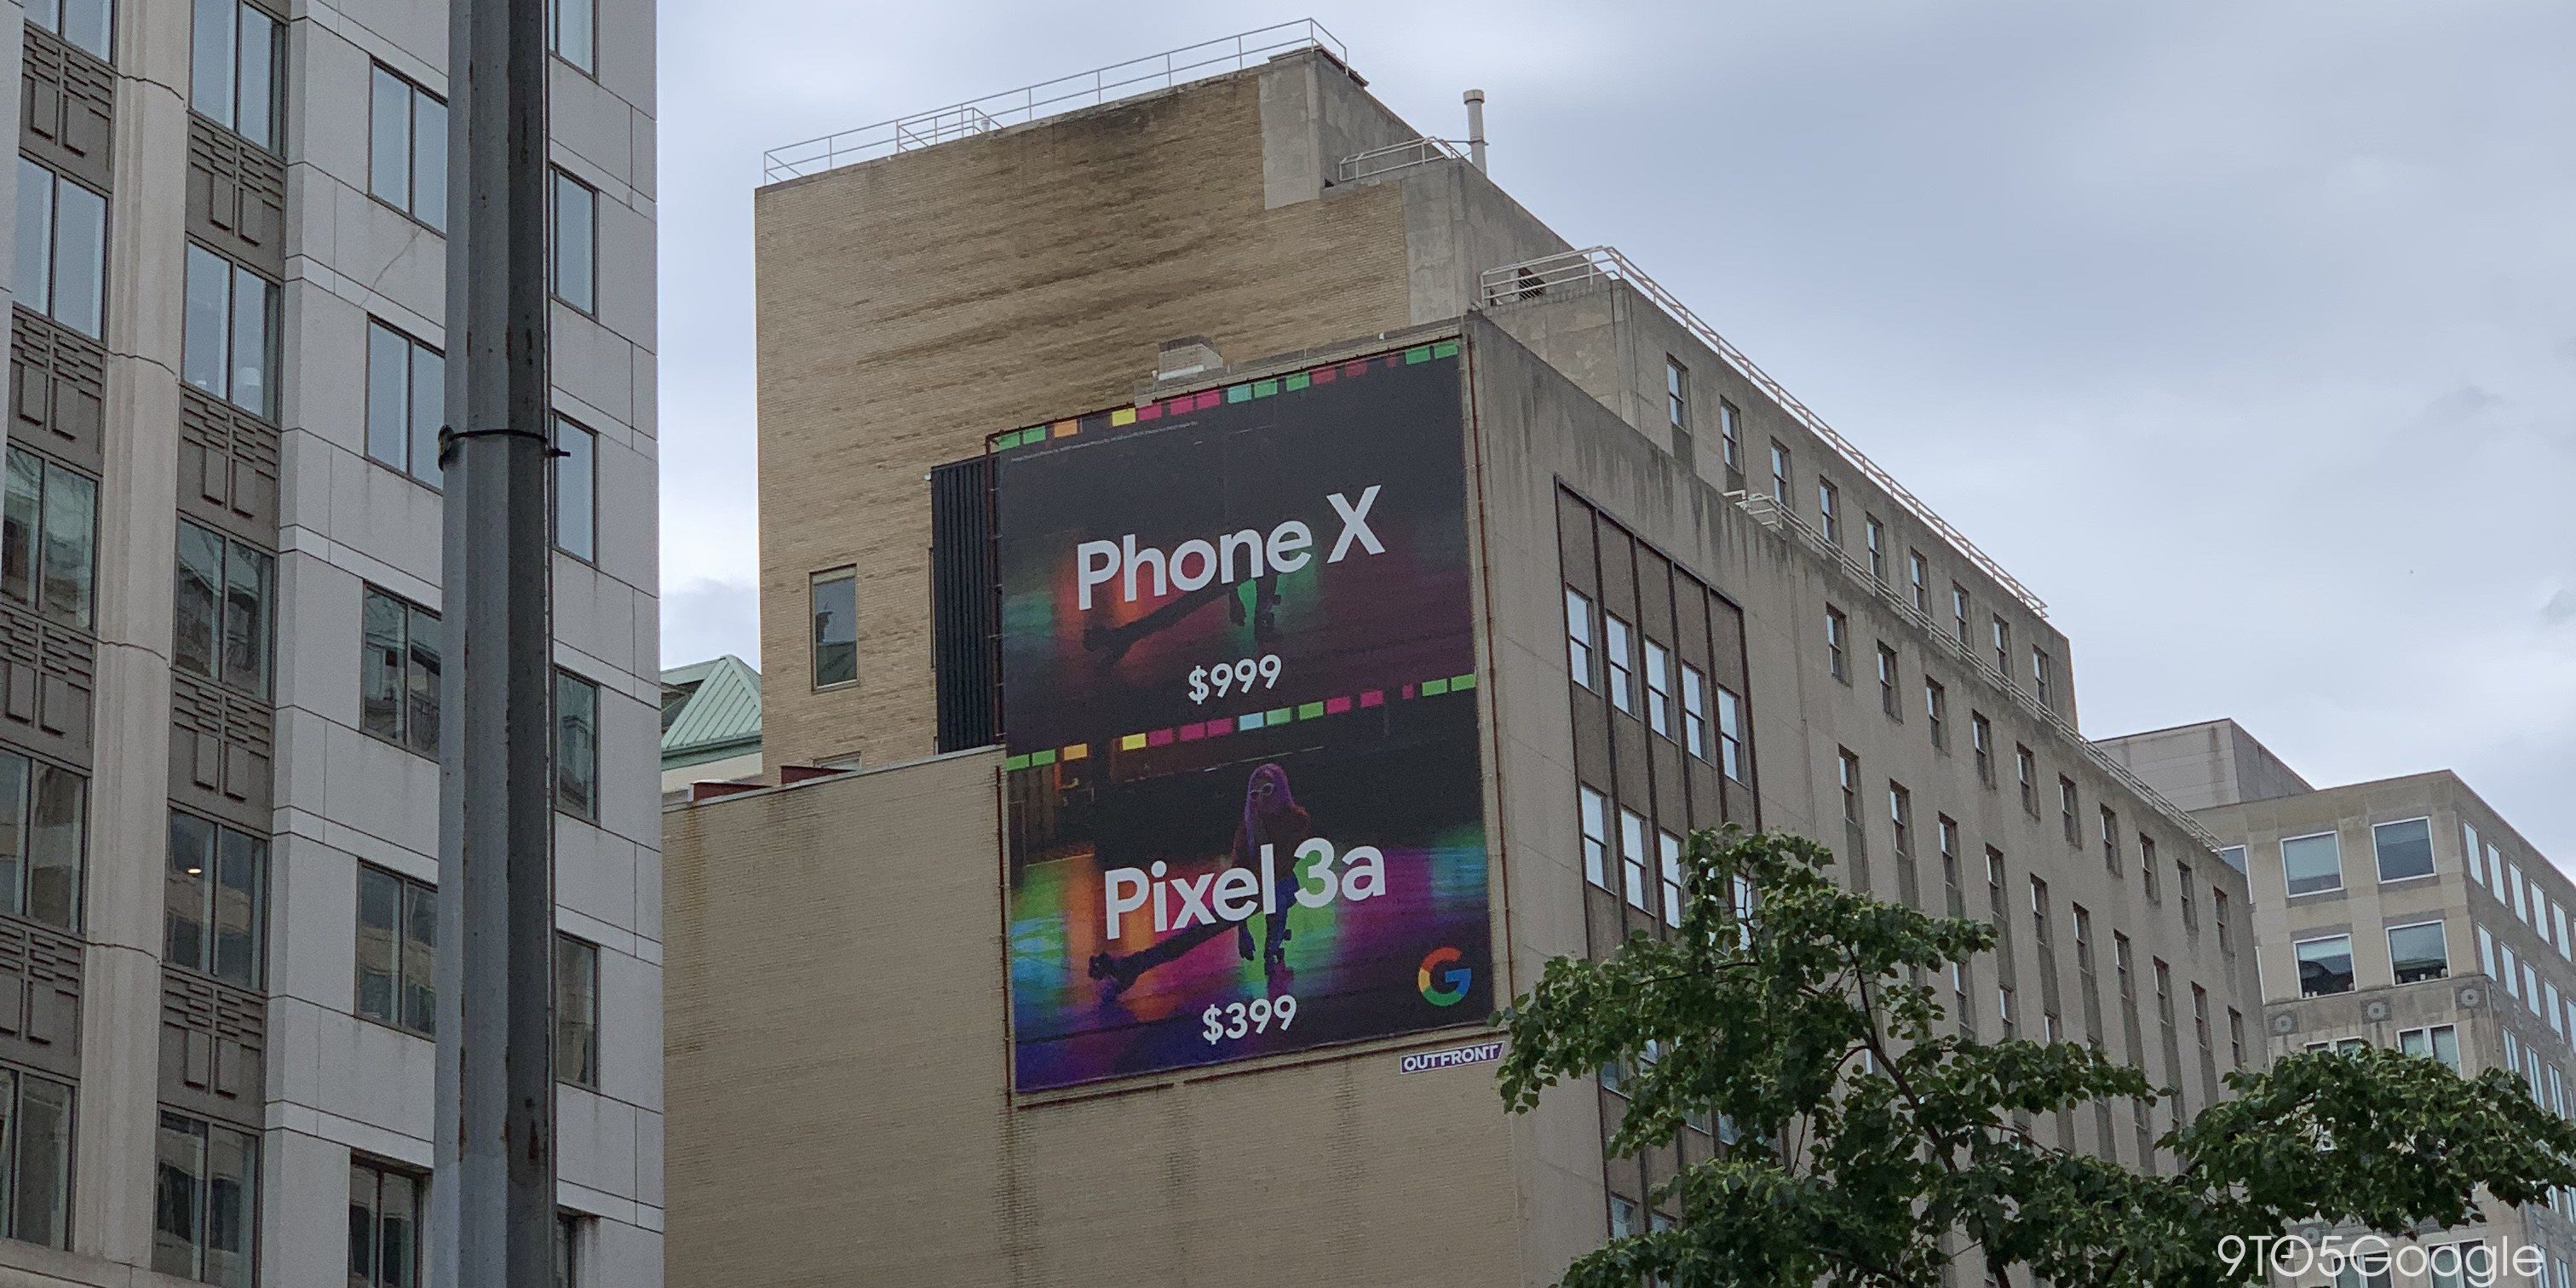 phone x vs pixel 3a werbung